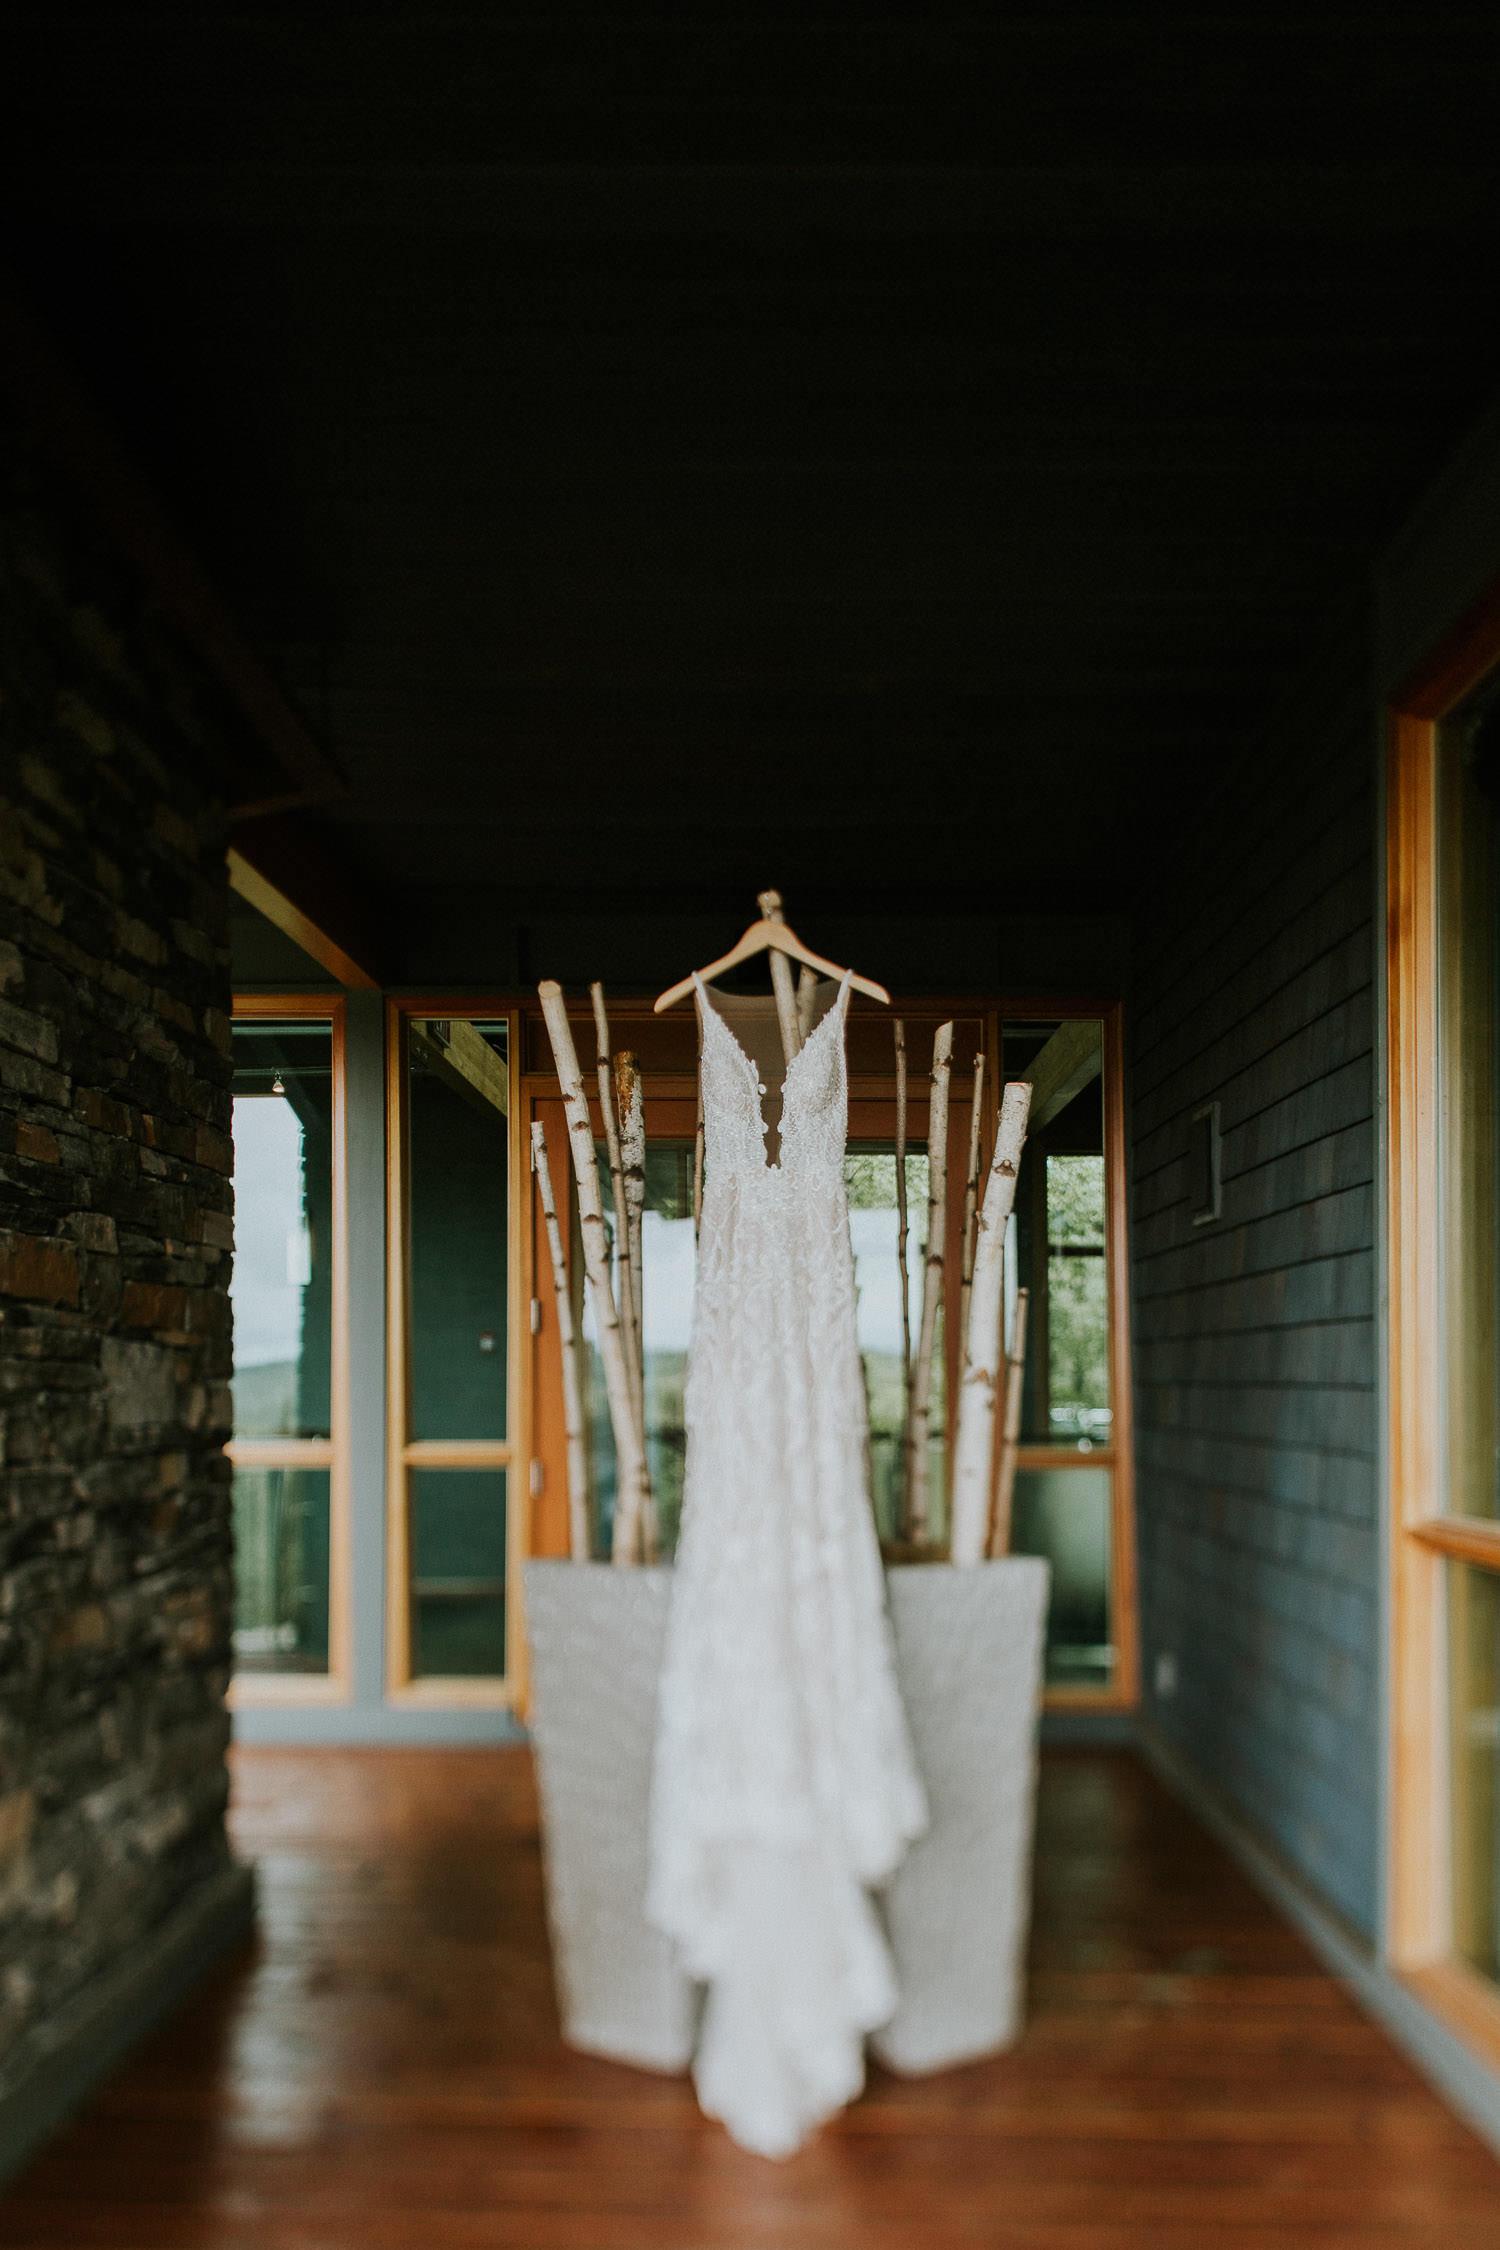 azuridge-estate-hotel-wedding-photographer-sarah-pukin-0023